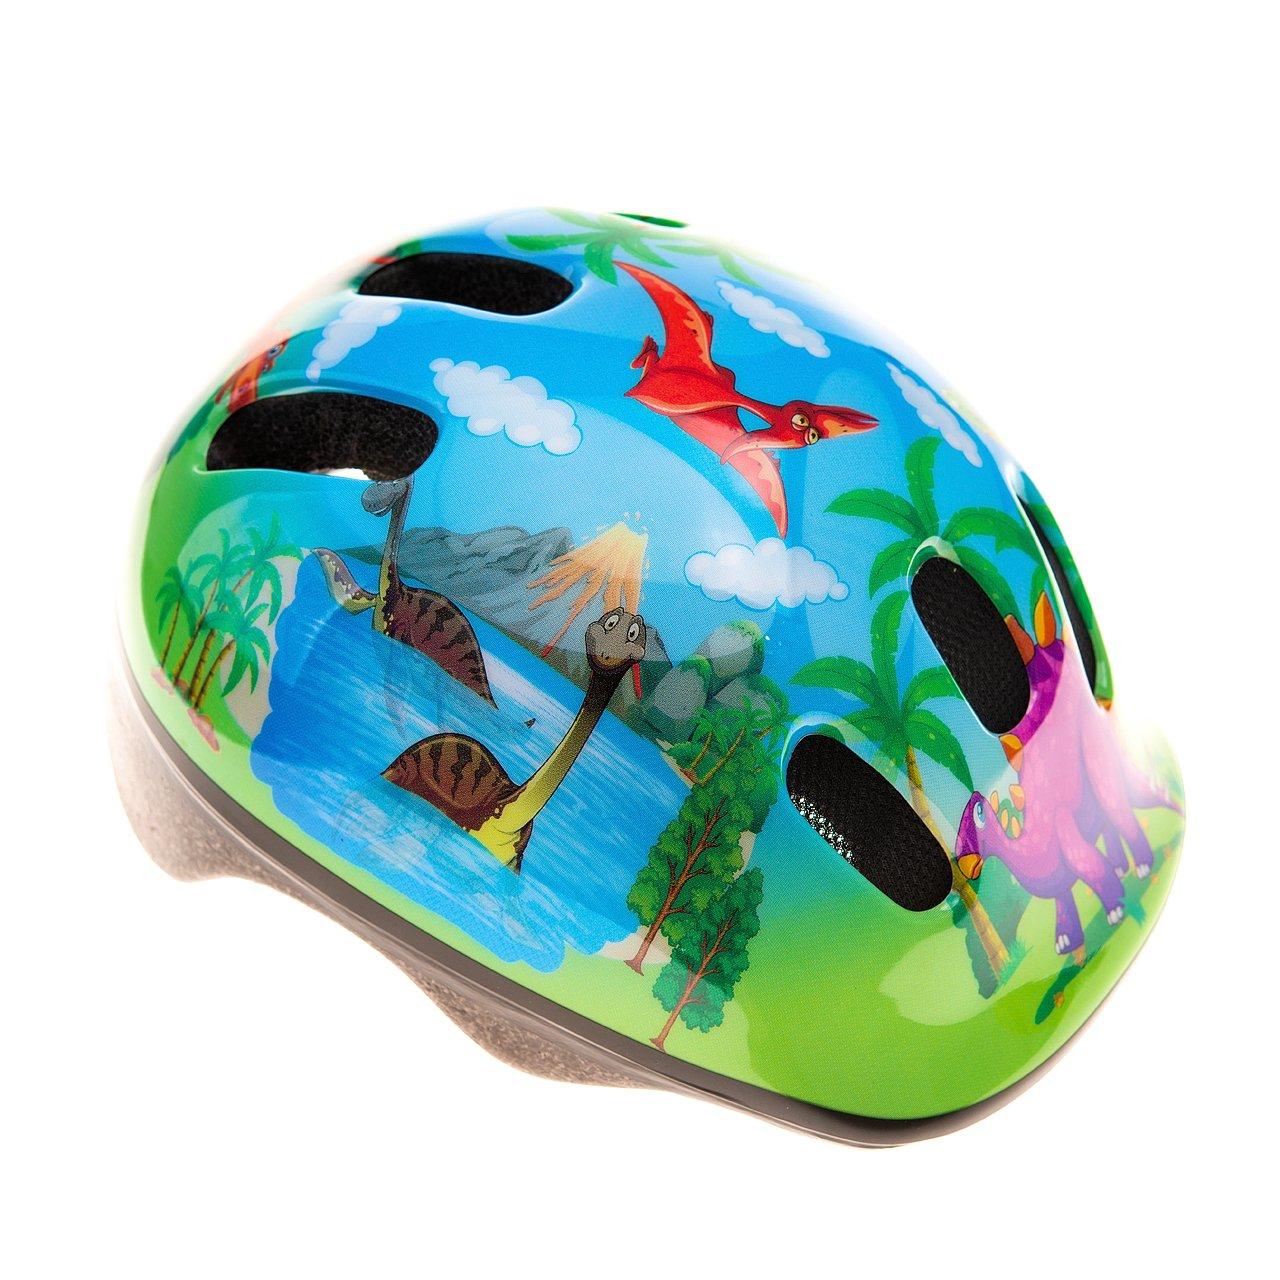 BeBeFun Intant/Toddler Size CPSC Certificated Kids Adjustable Bike/Cycling Helmet Boy Girl Sports Safety Helmet by BeBeFun